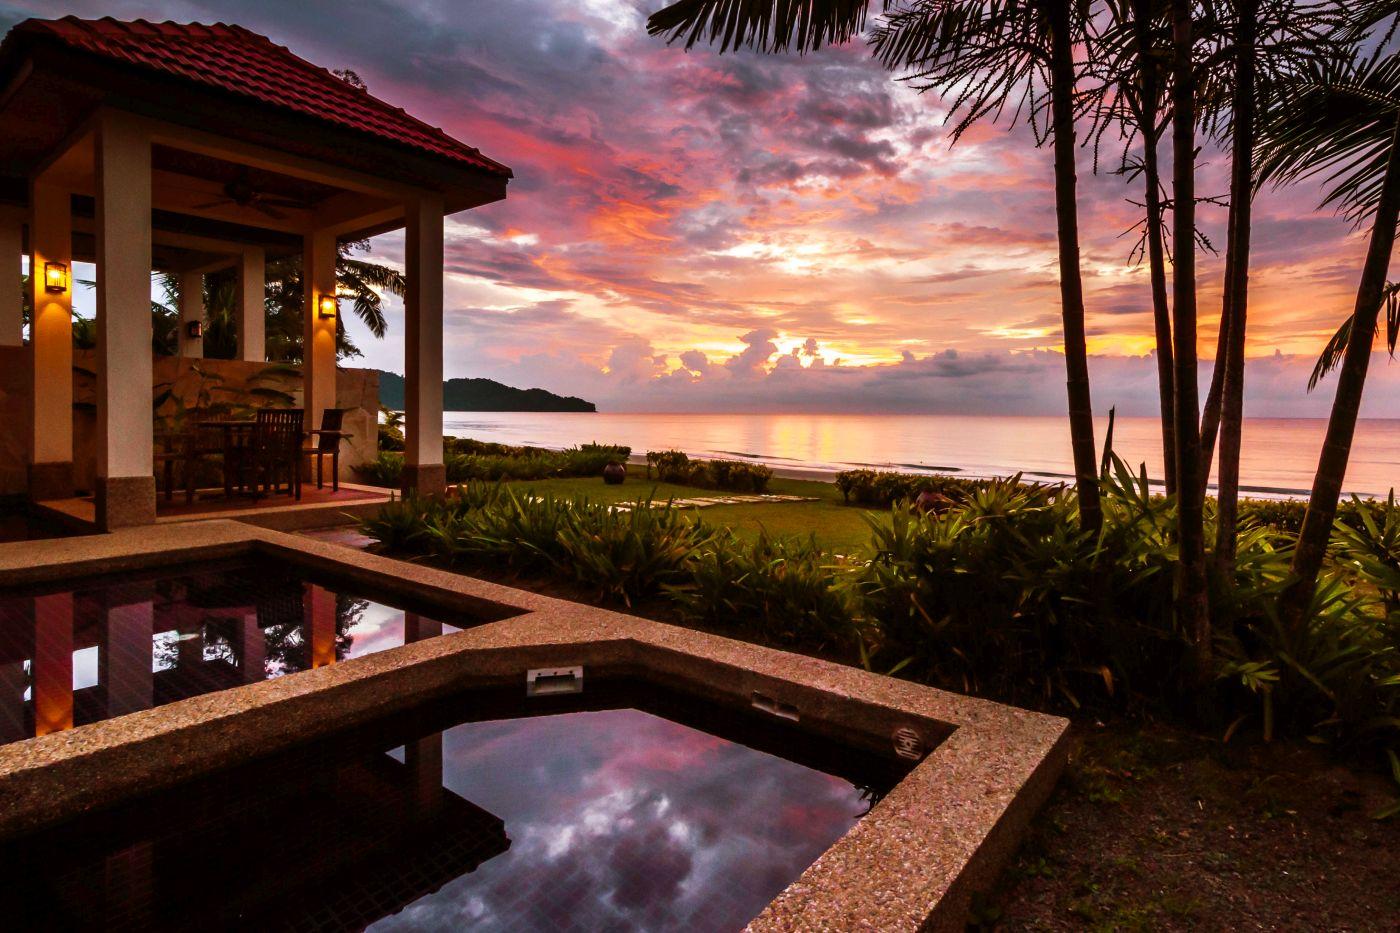 Image from Borneo Beach Villas/Facebook